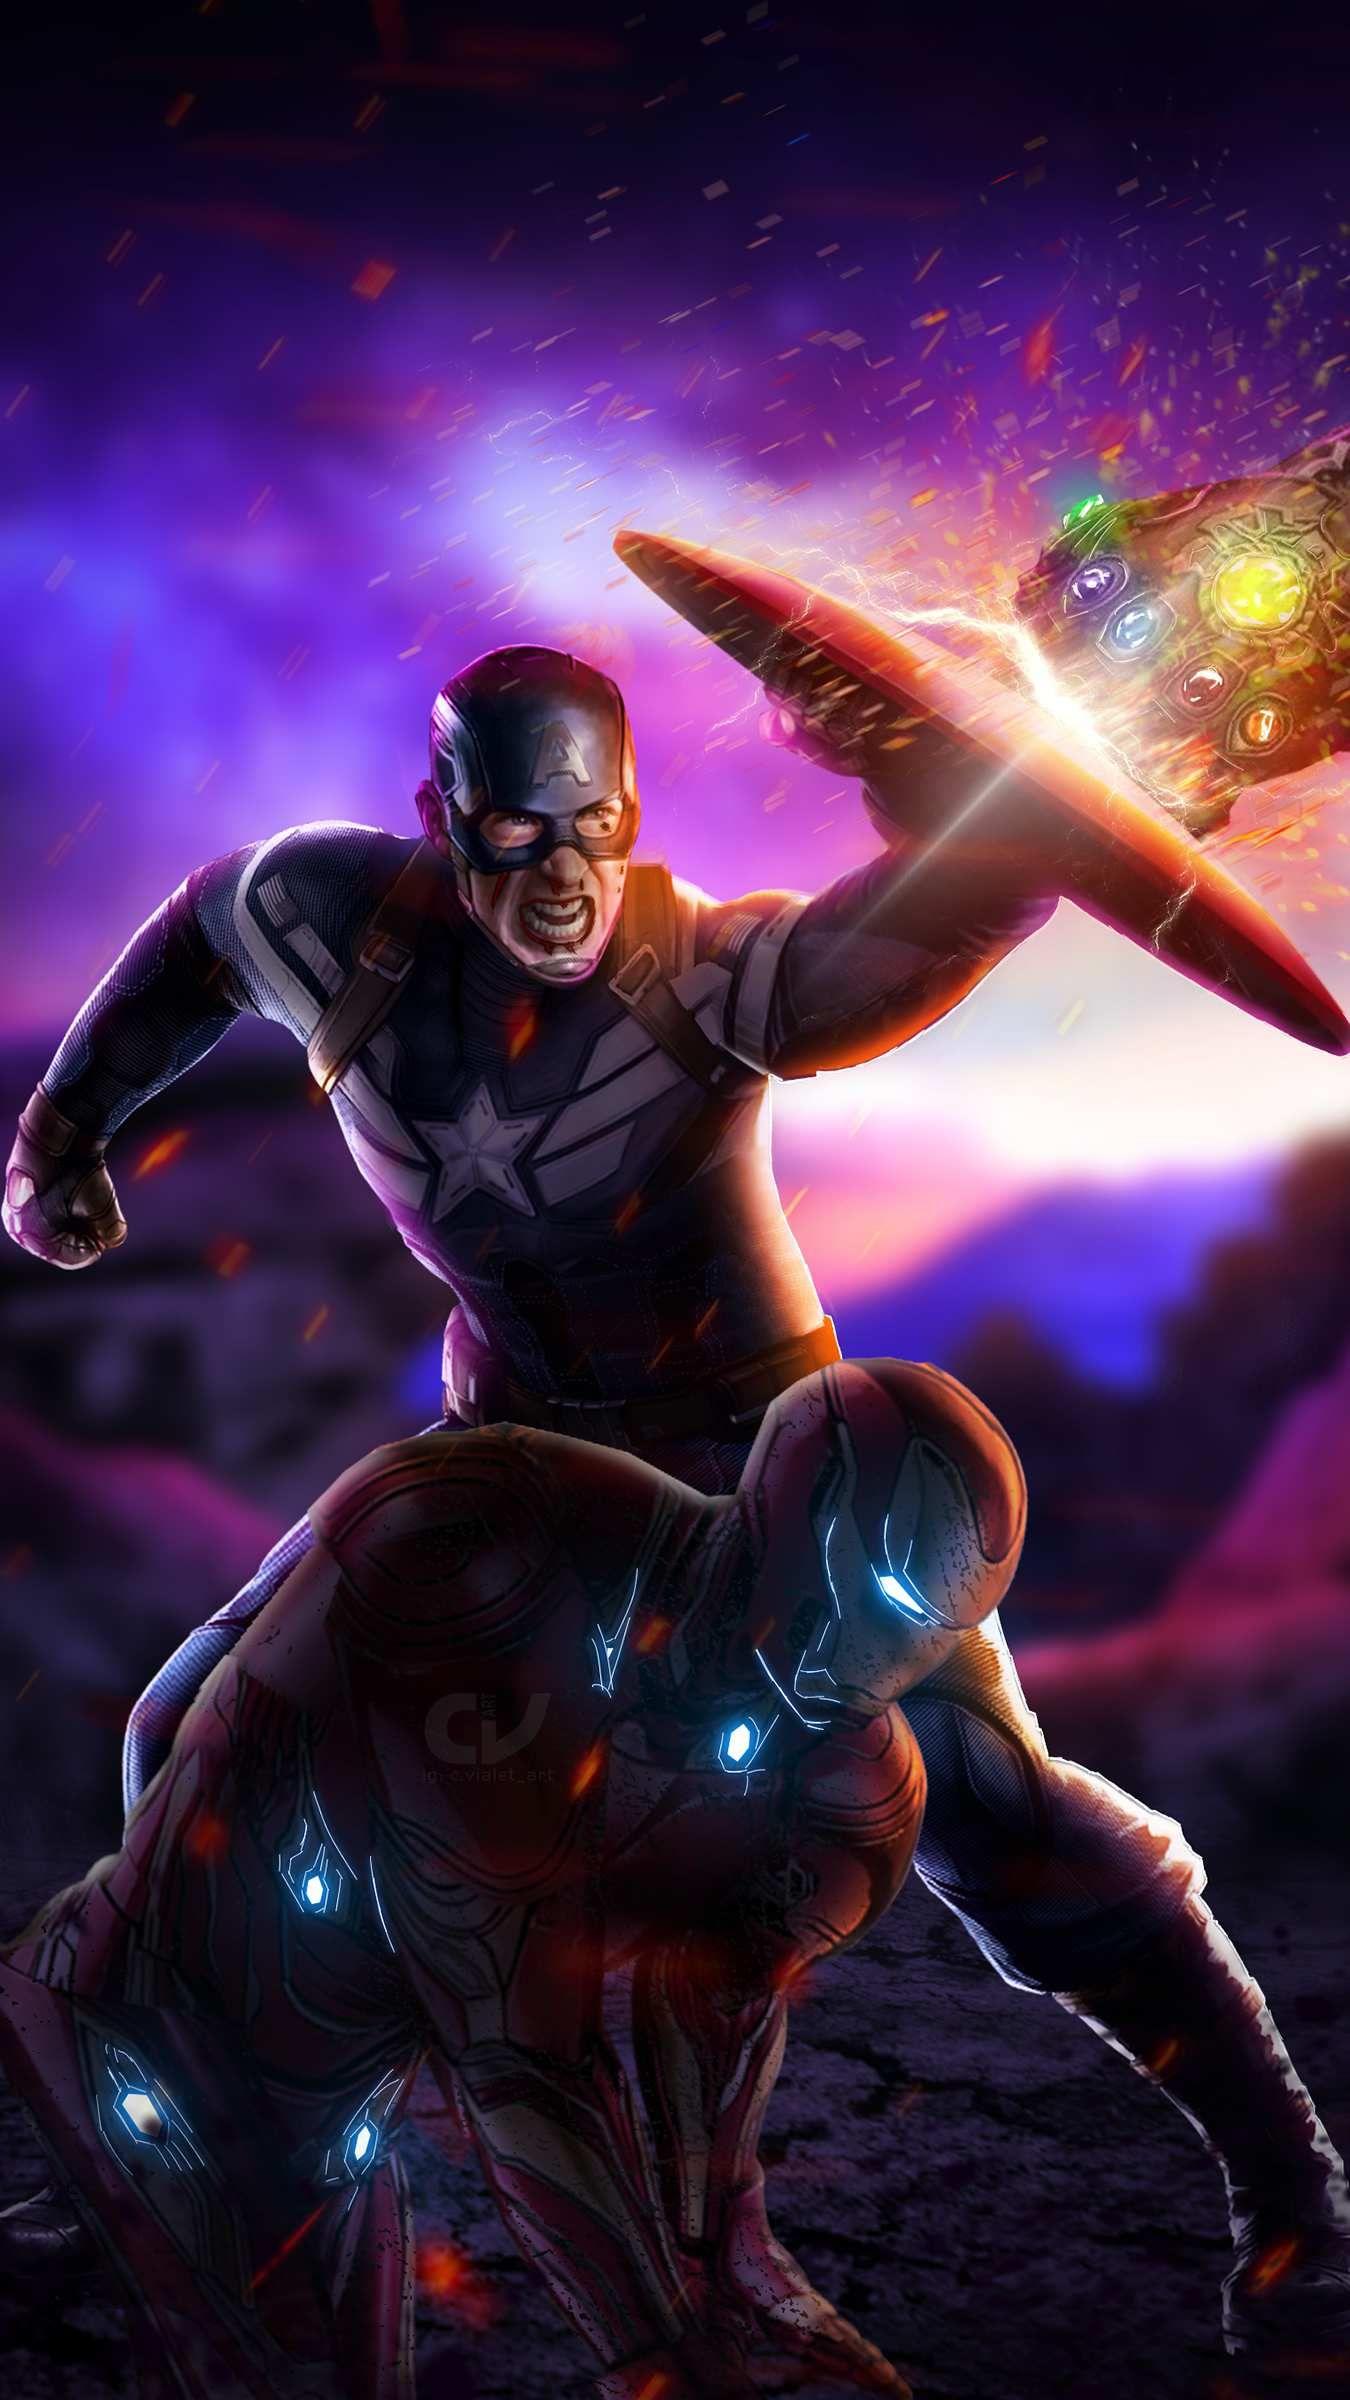 Captain And Tony Fighting Thanos Avengers Endgame Iphone Wallpaper Captain America Wallpaper Marvel Movies Avengers Wallpaper